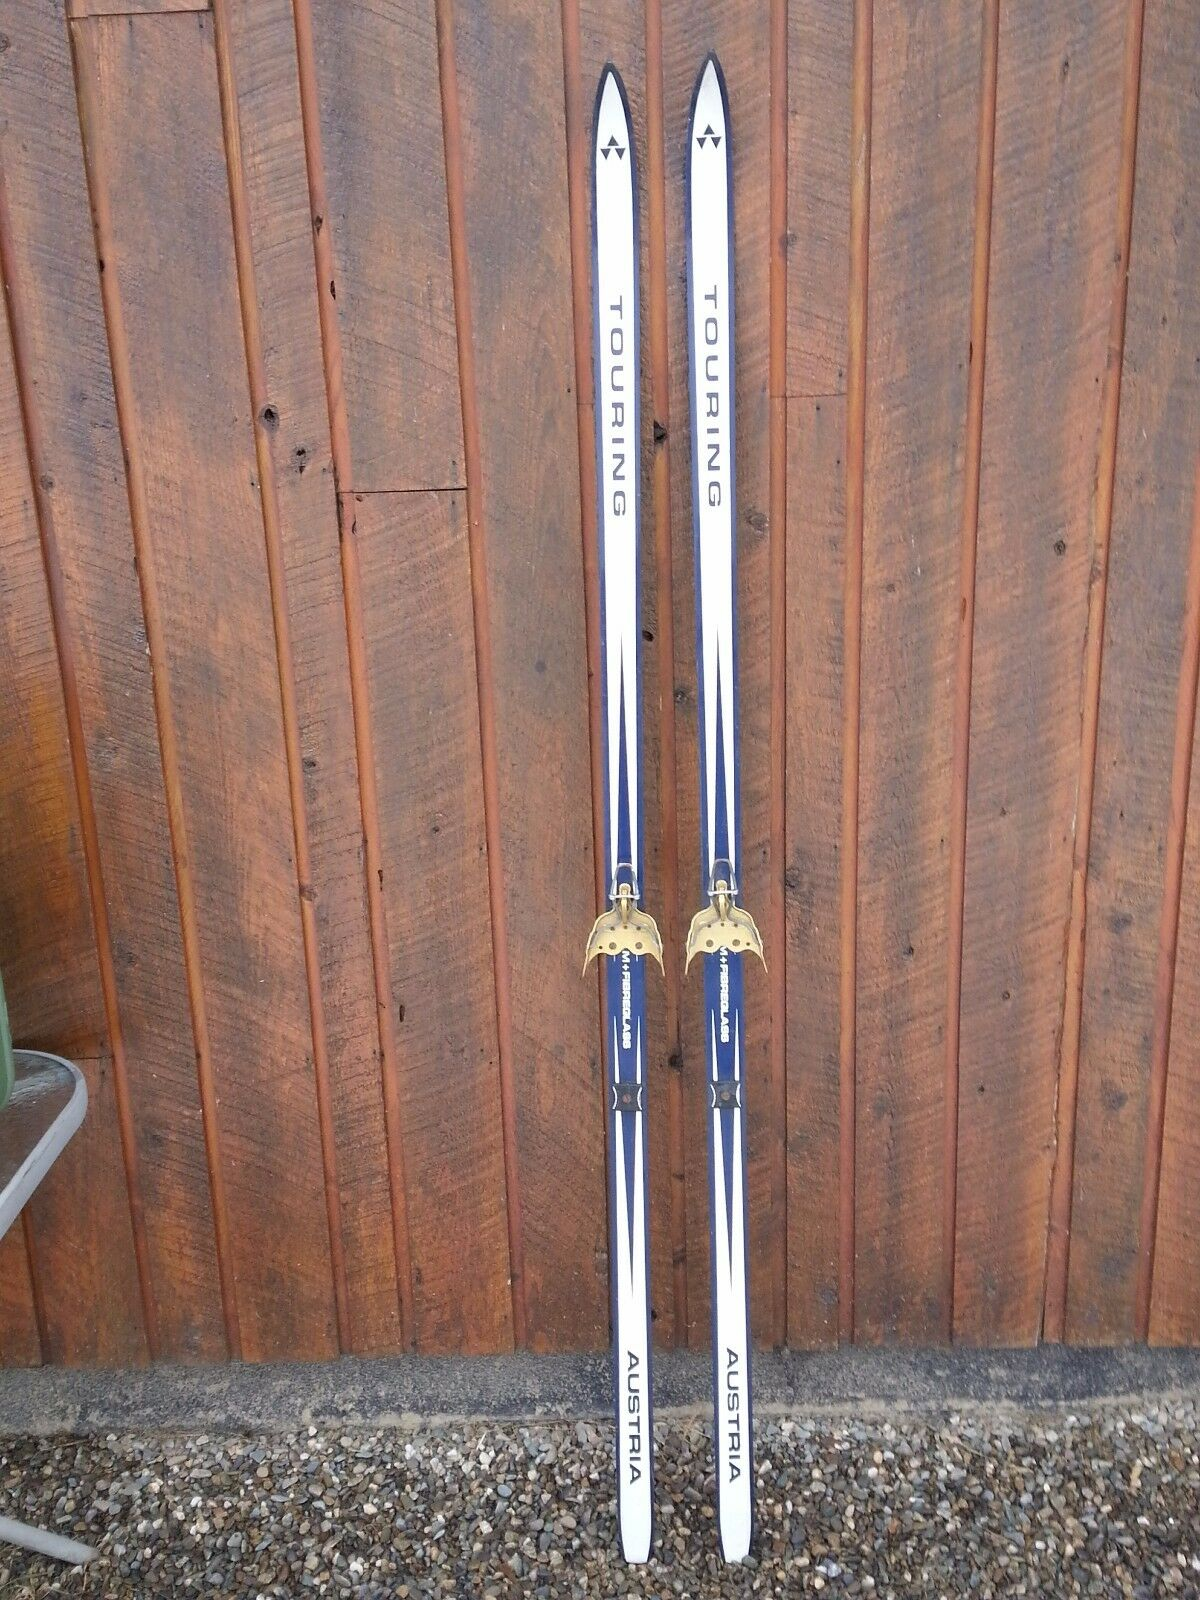 OLD Interesting Vintage Wooden 72   Long Skis blueE + WHITE Finish Signed TOURING  good reputation